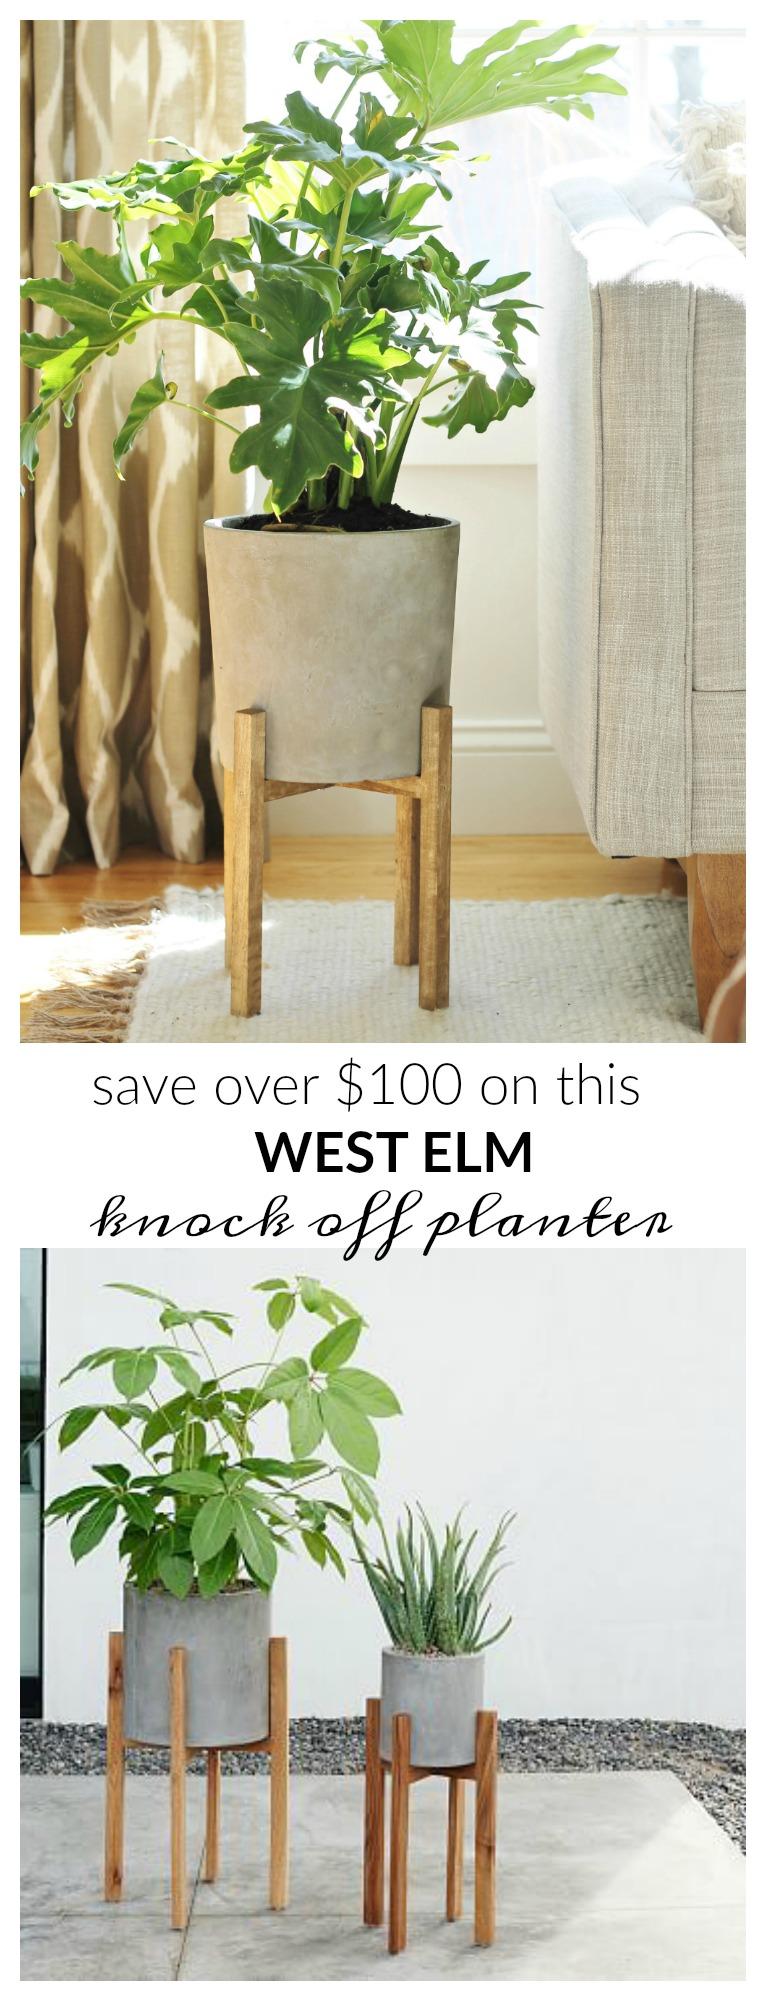 West-Elm-Knock-Off-Planter-Save-over-100